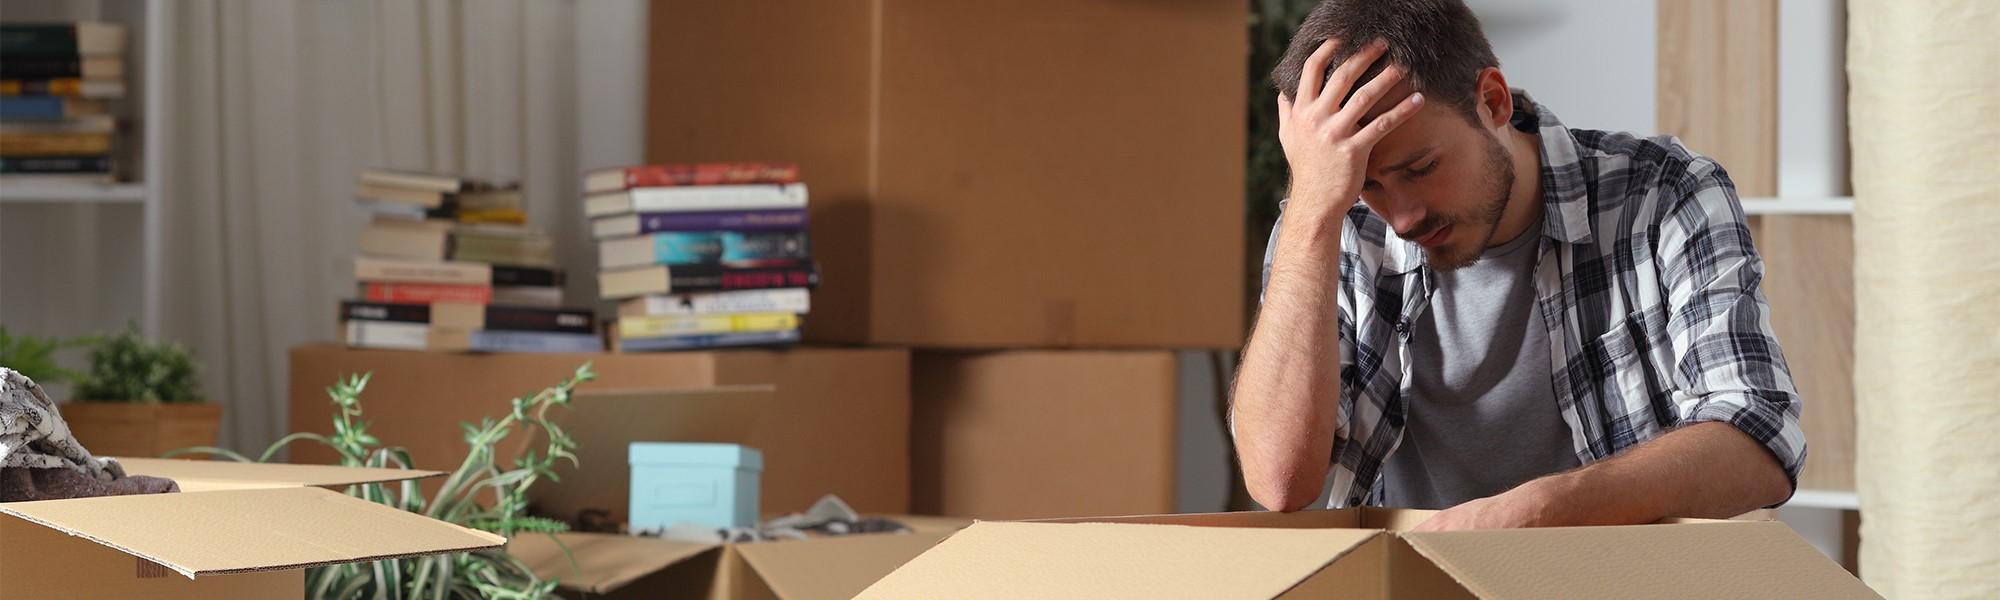 man facing eviction